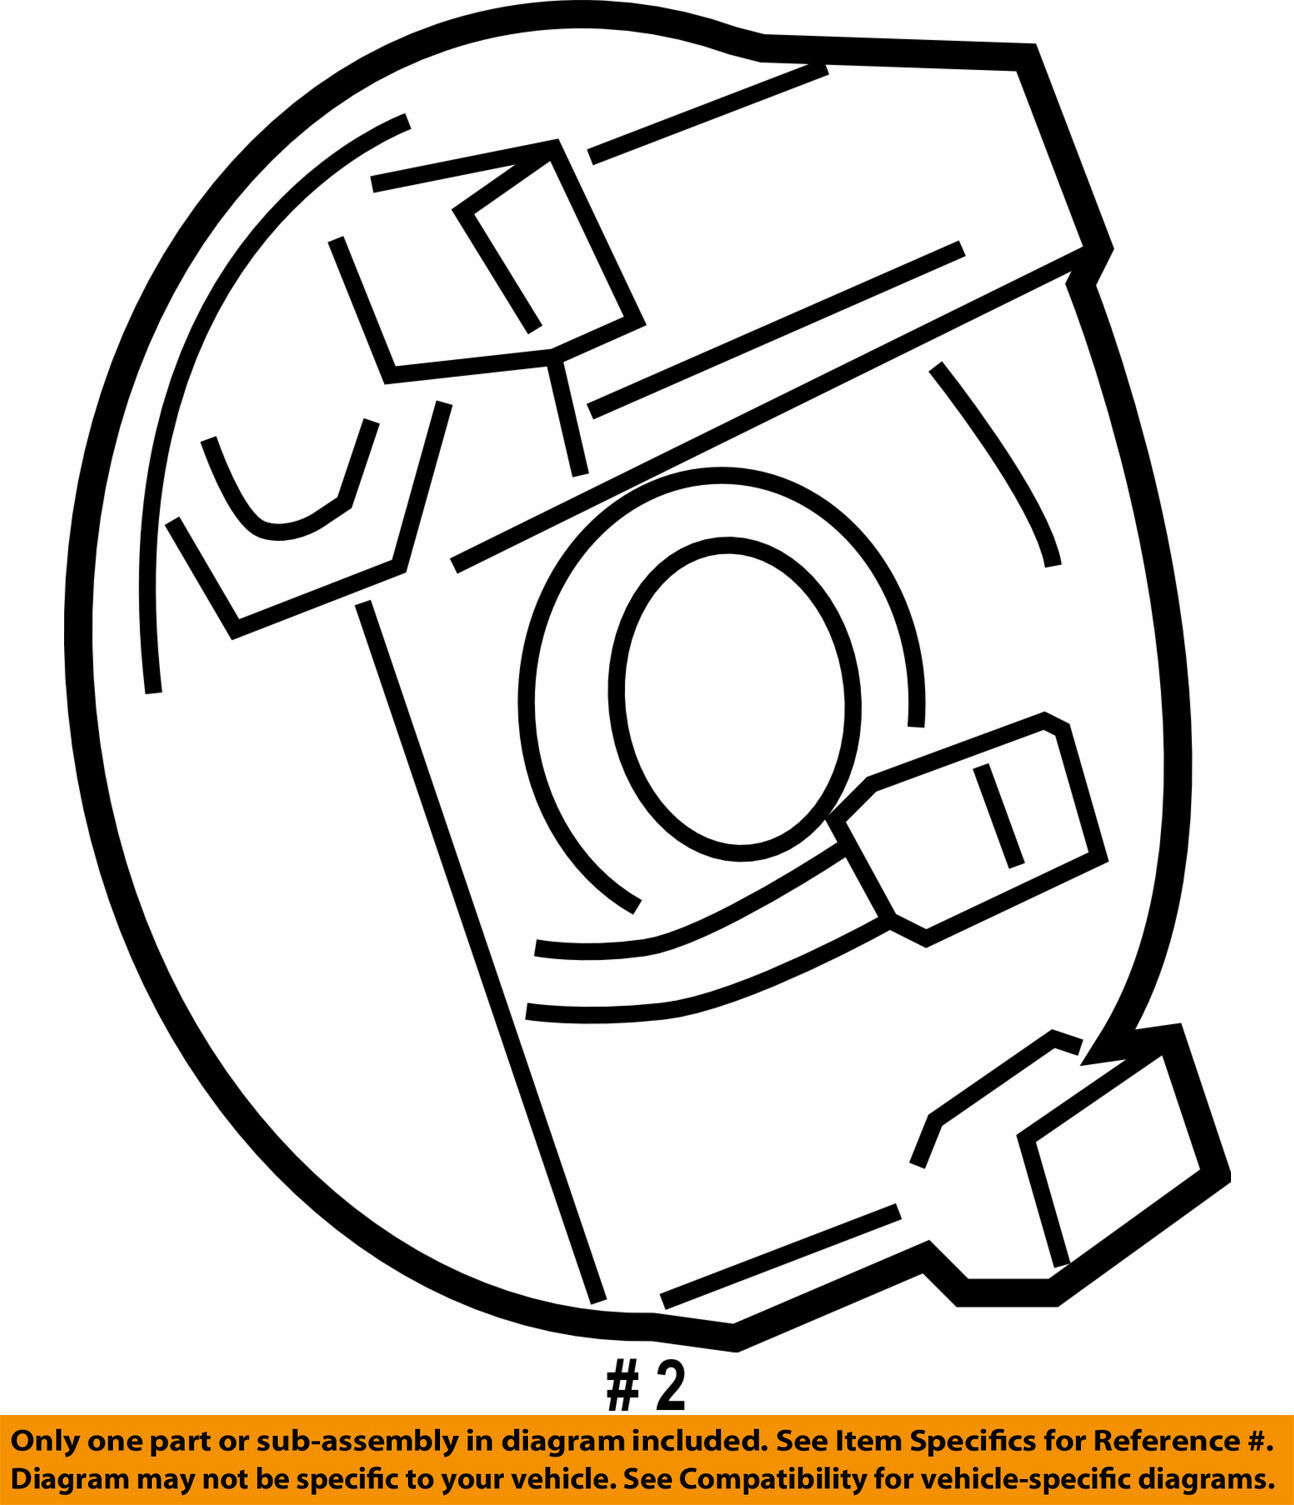 2007 2018 Chrysler Dodge Jeep Airbag Steering Wheel Clockspring Tj Clock Spring Wiring Diagram Norton Secured Powered By Verisign